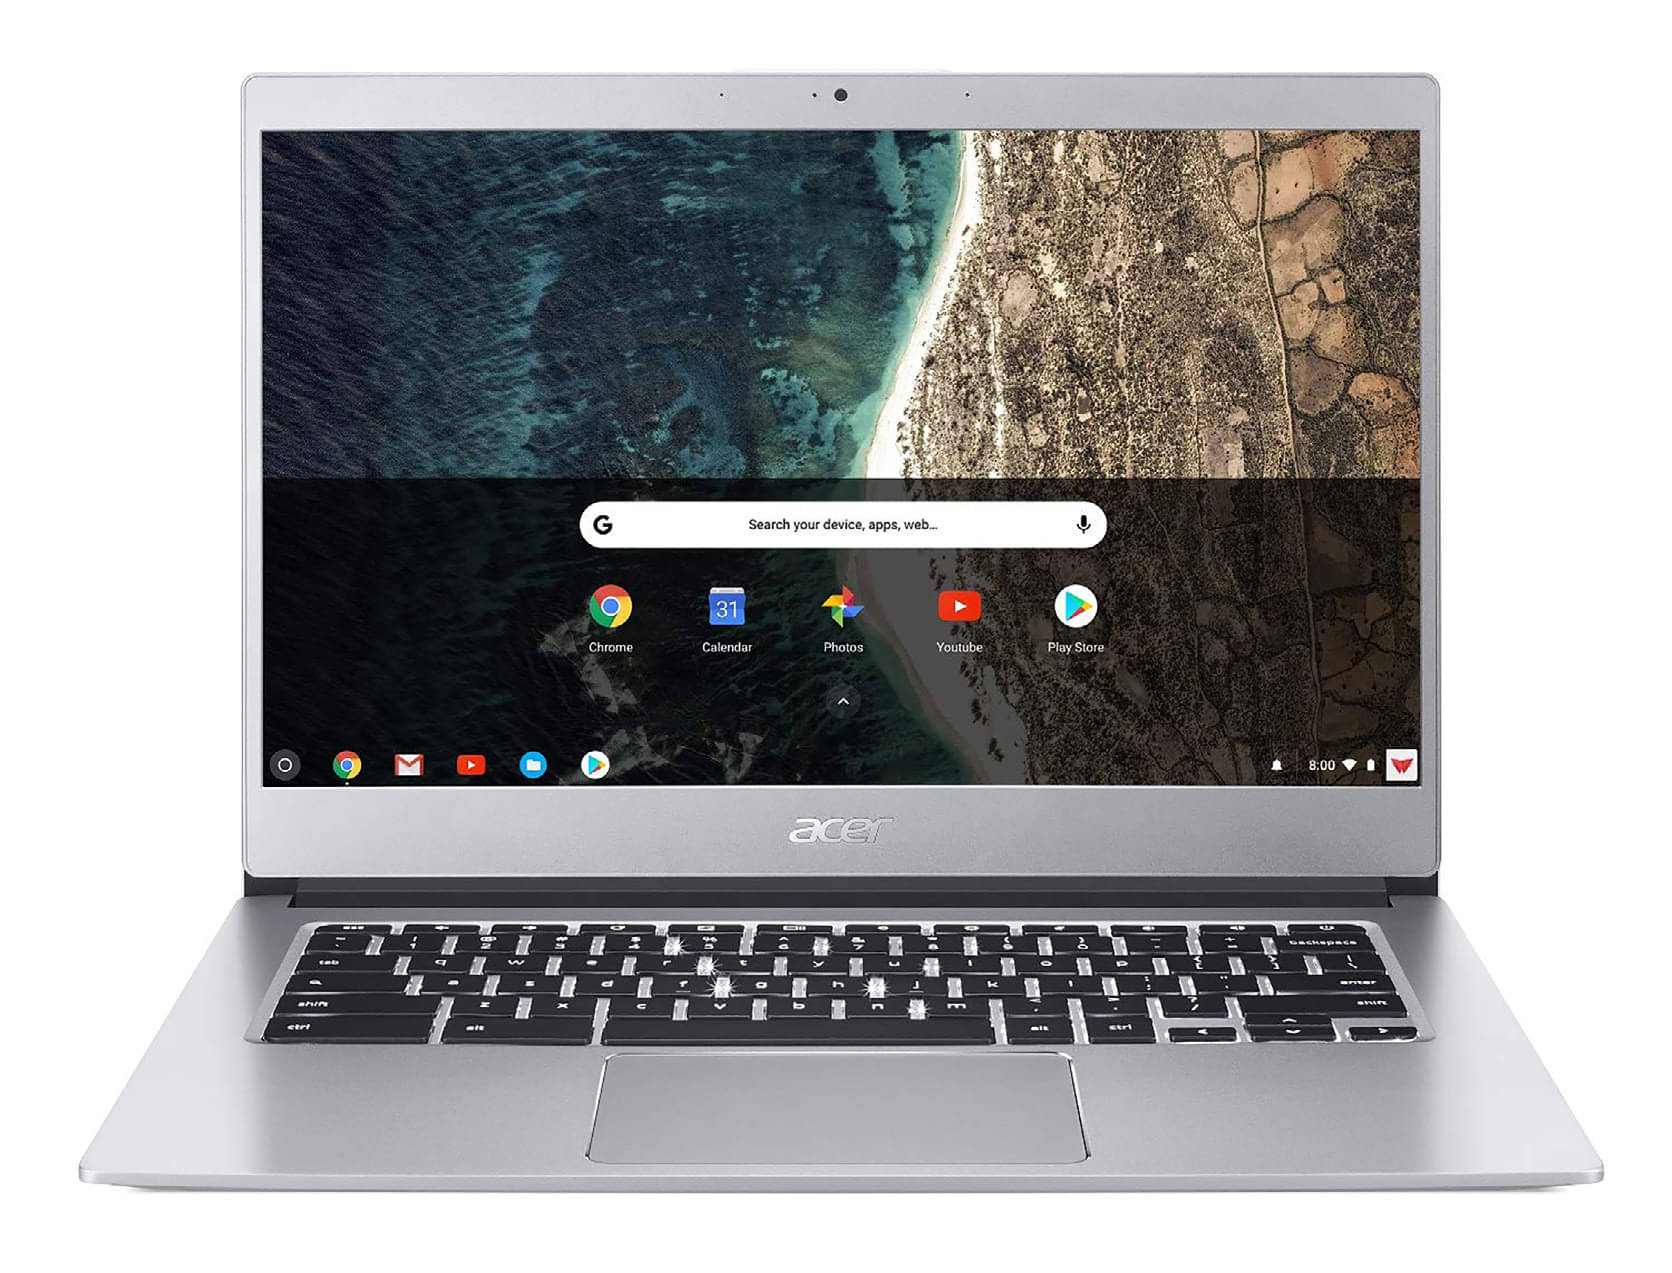 Acer Chromebook 514: A Standout Choice